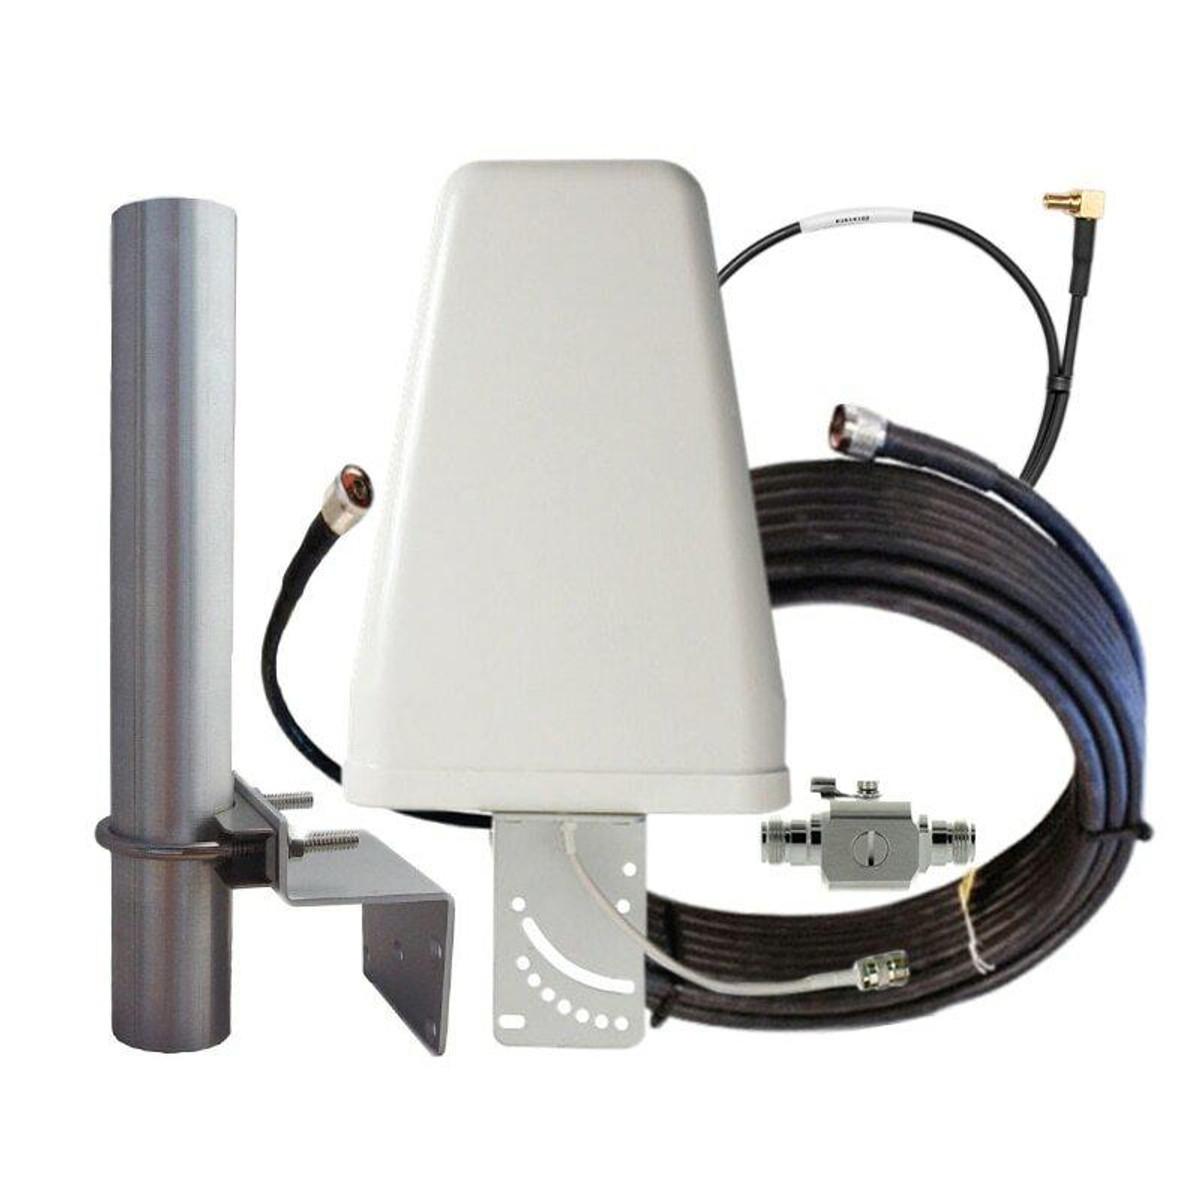 Hotspot TS9 Yagi Antenna Expansion Pack